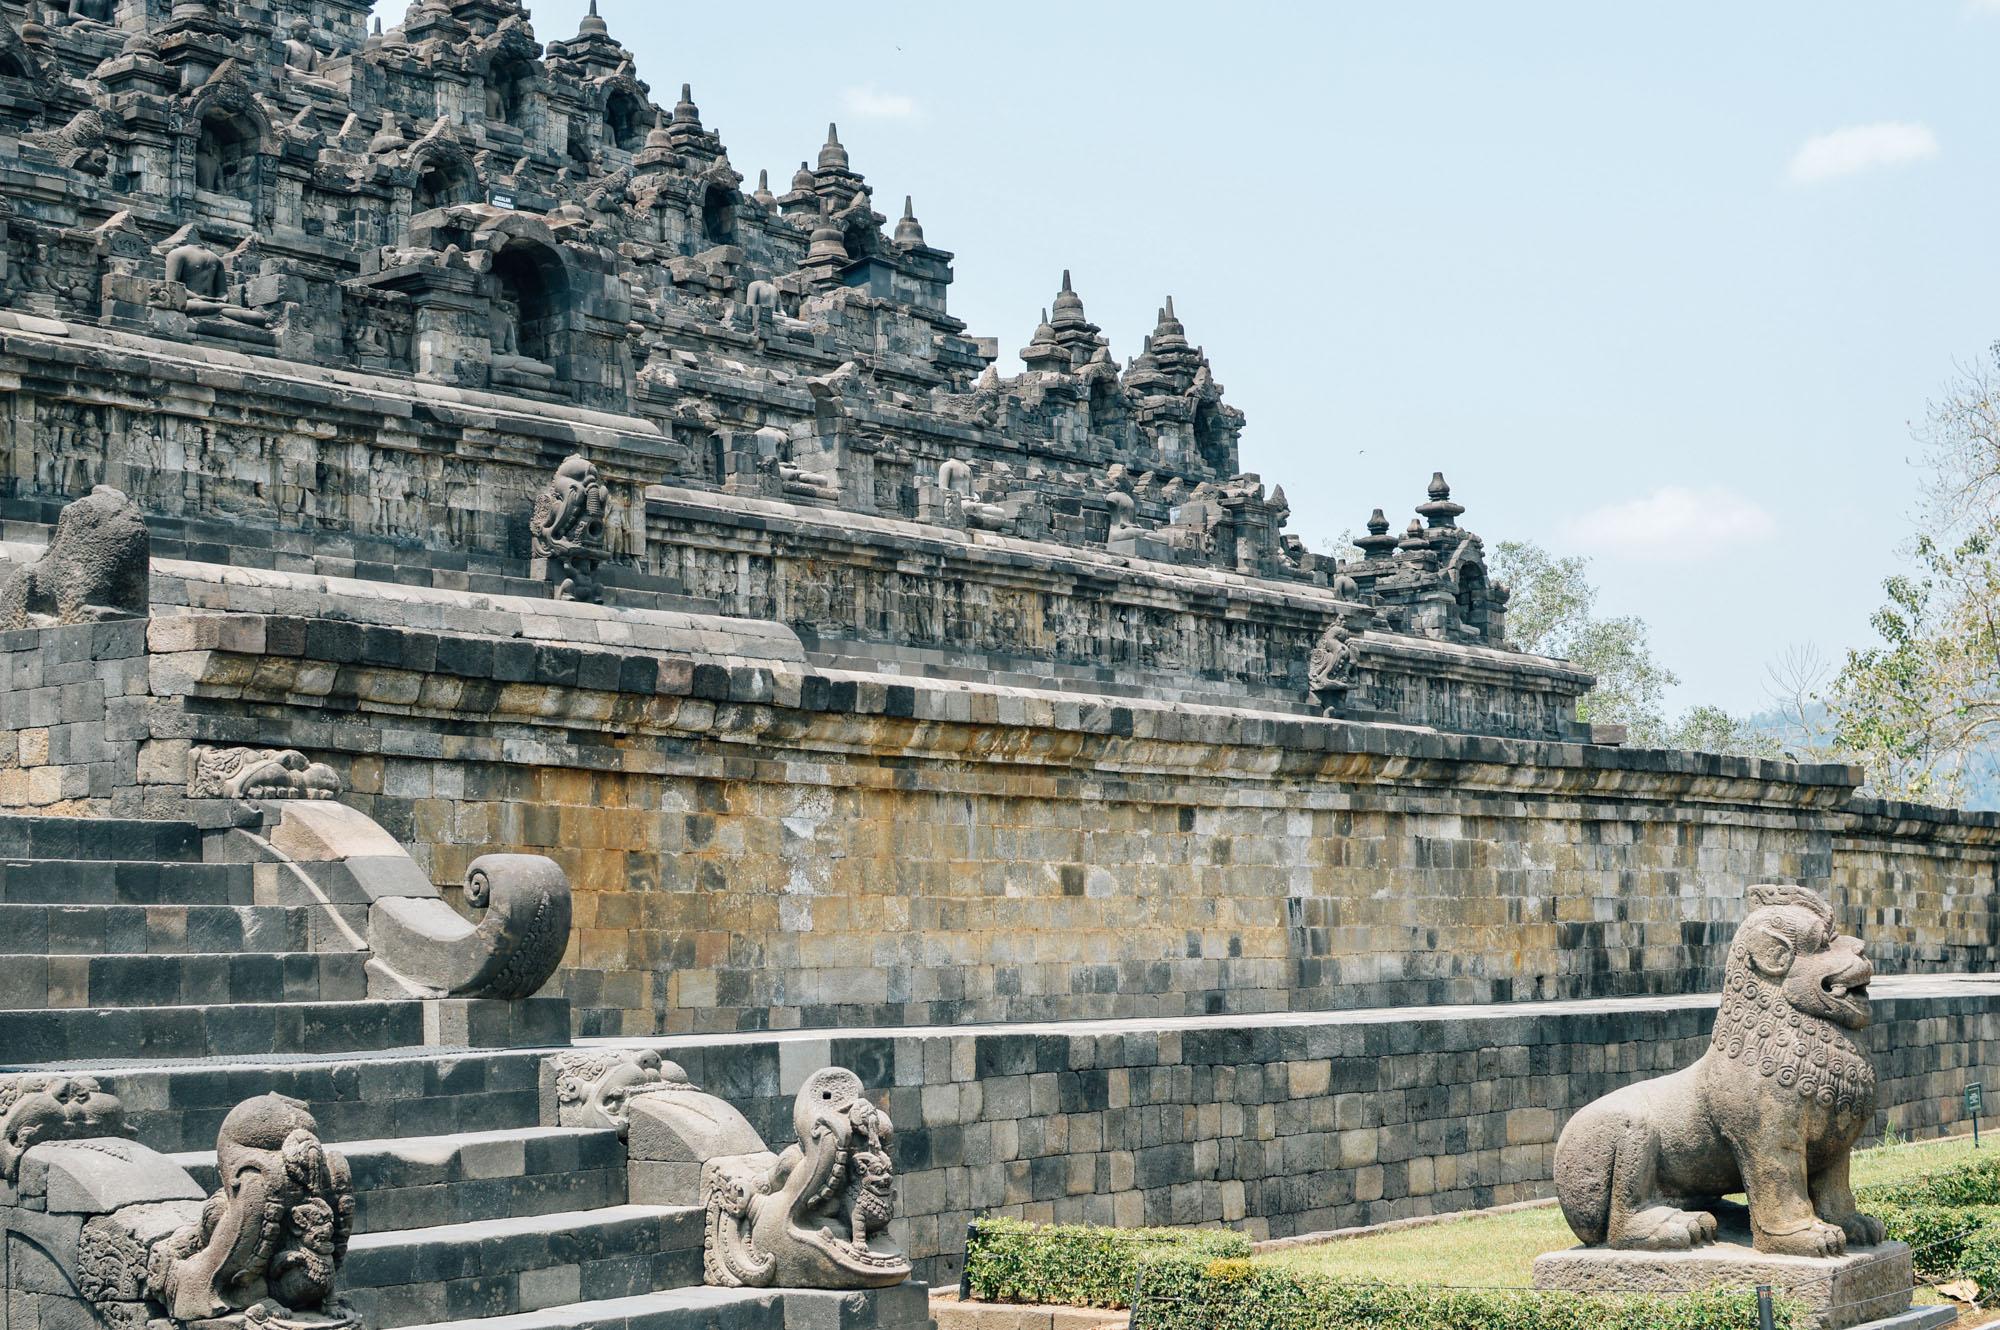 yogya 1 4 - Jogyakarta with Temples